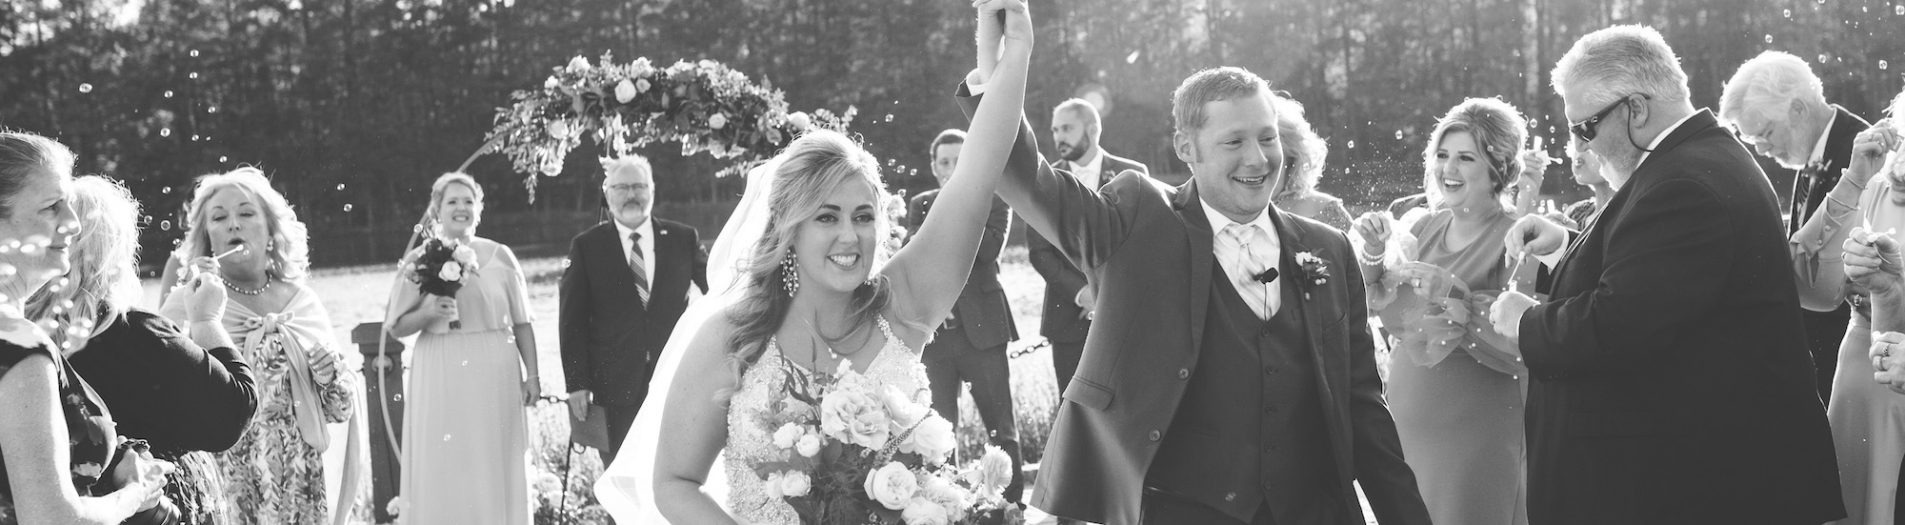 Angus Barn Pavilion Wedding in Raleigh, NC | Christie + Chris